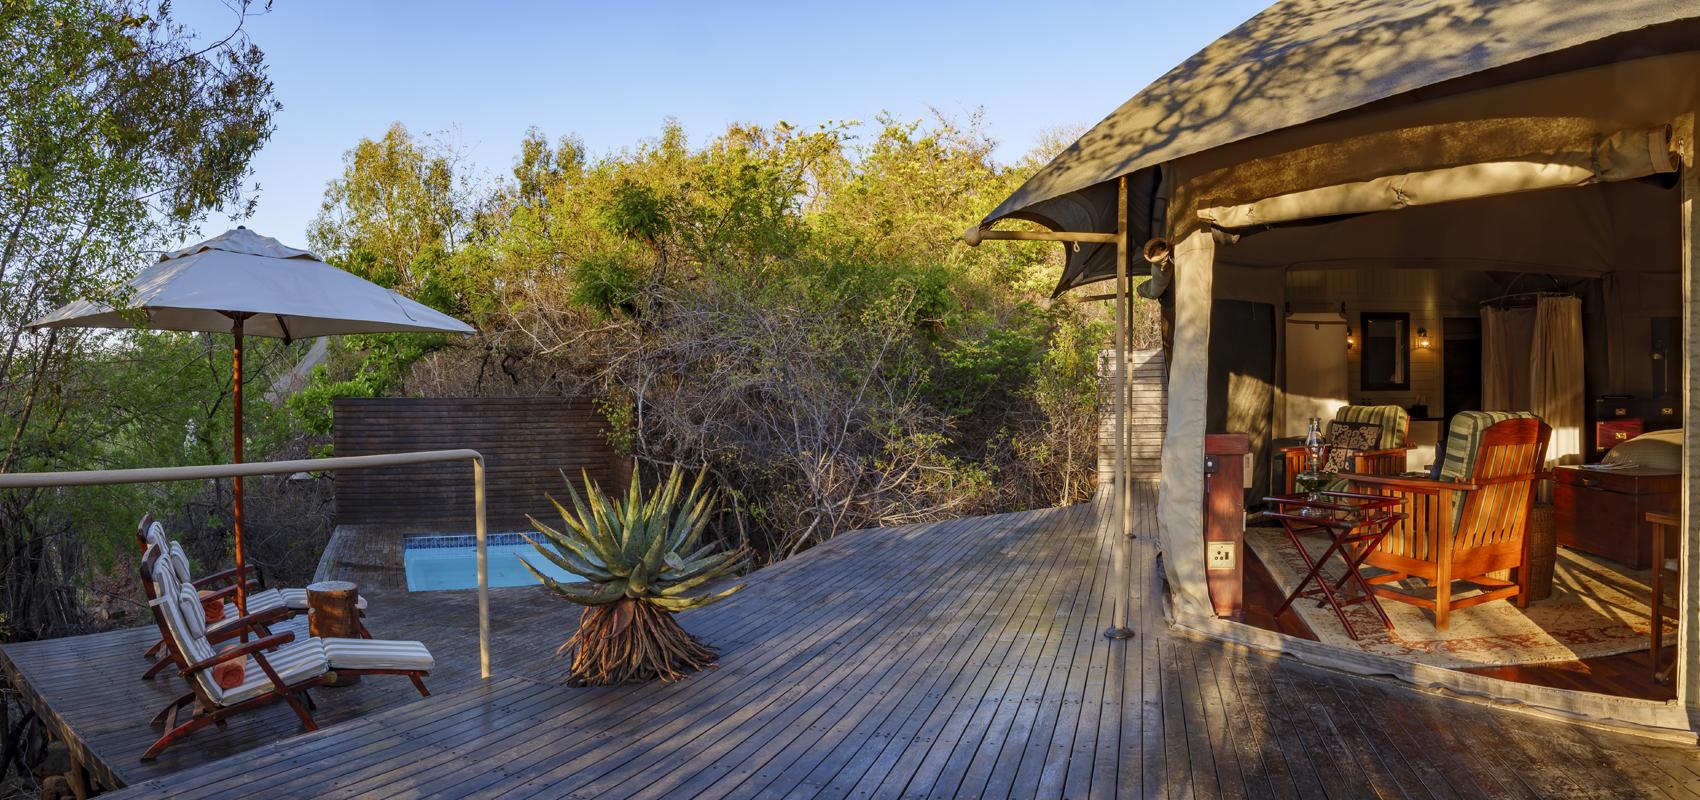 Nkomazi_Private_Game_Reserve-Tent_Repairs_revised-dates